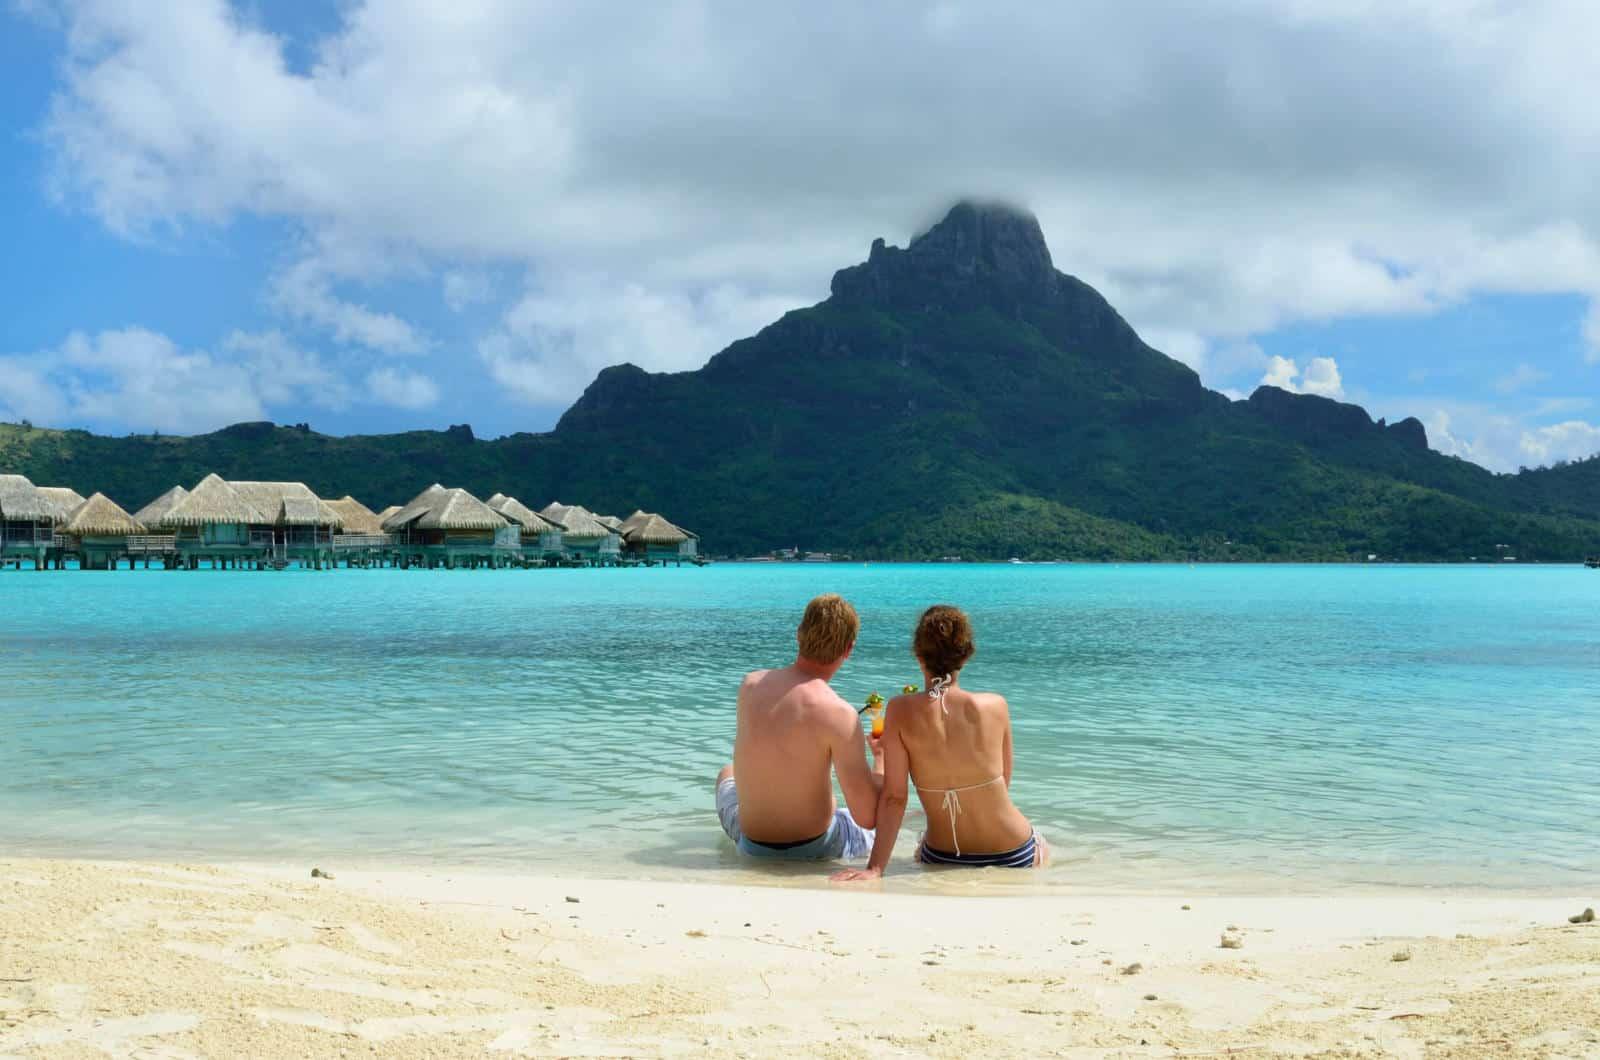 Tahiti Vs Bora Bora Vs Moorea - which is the most romantic island for honeymoons?